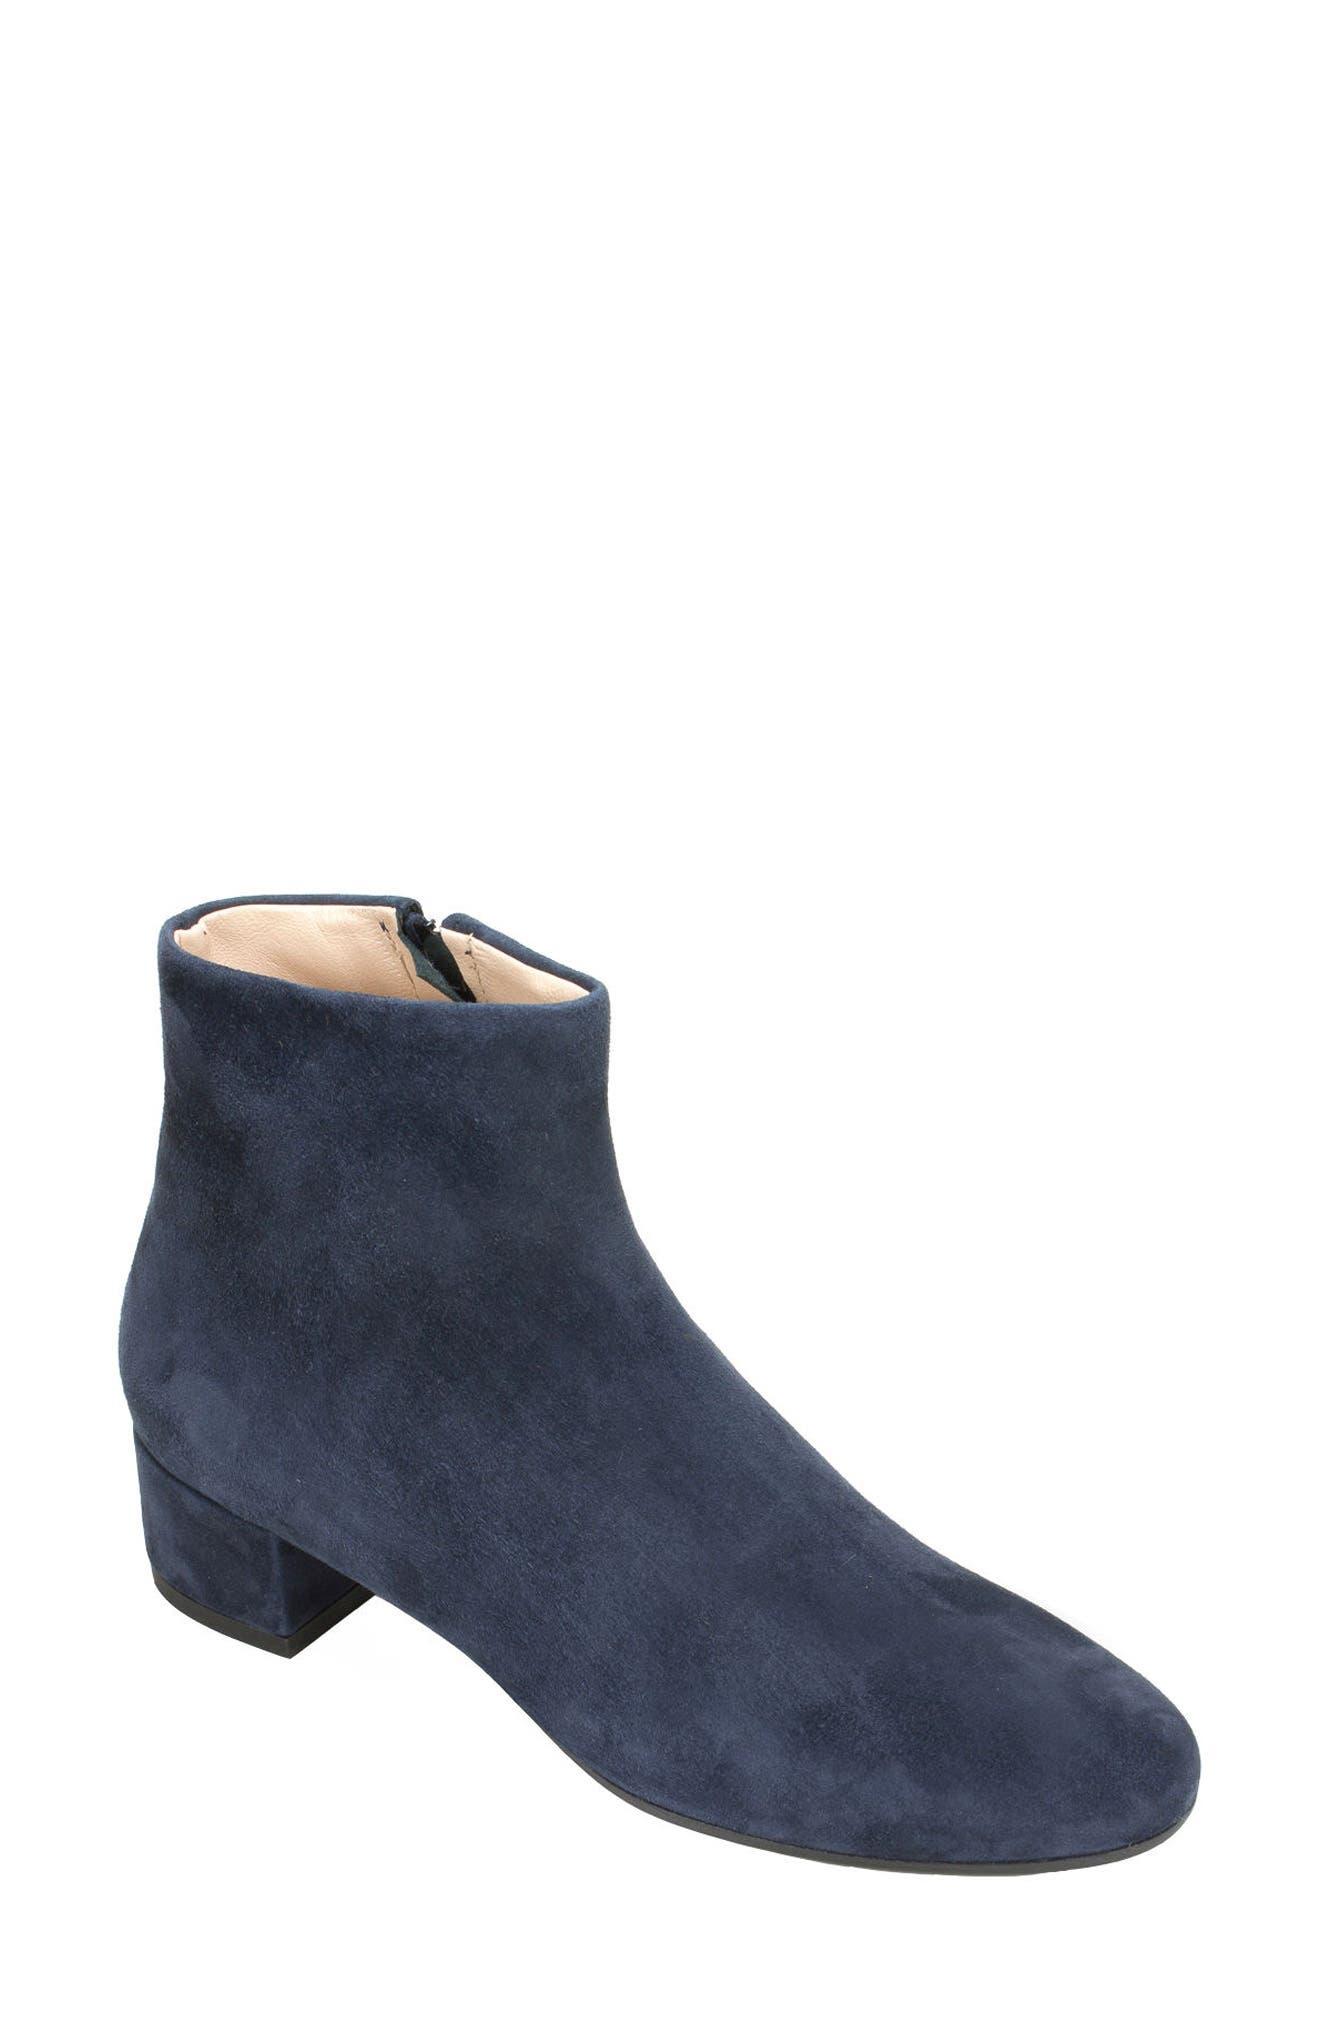 Jordie Block Heel Bootie,                         Main,                         color, Blue Suede